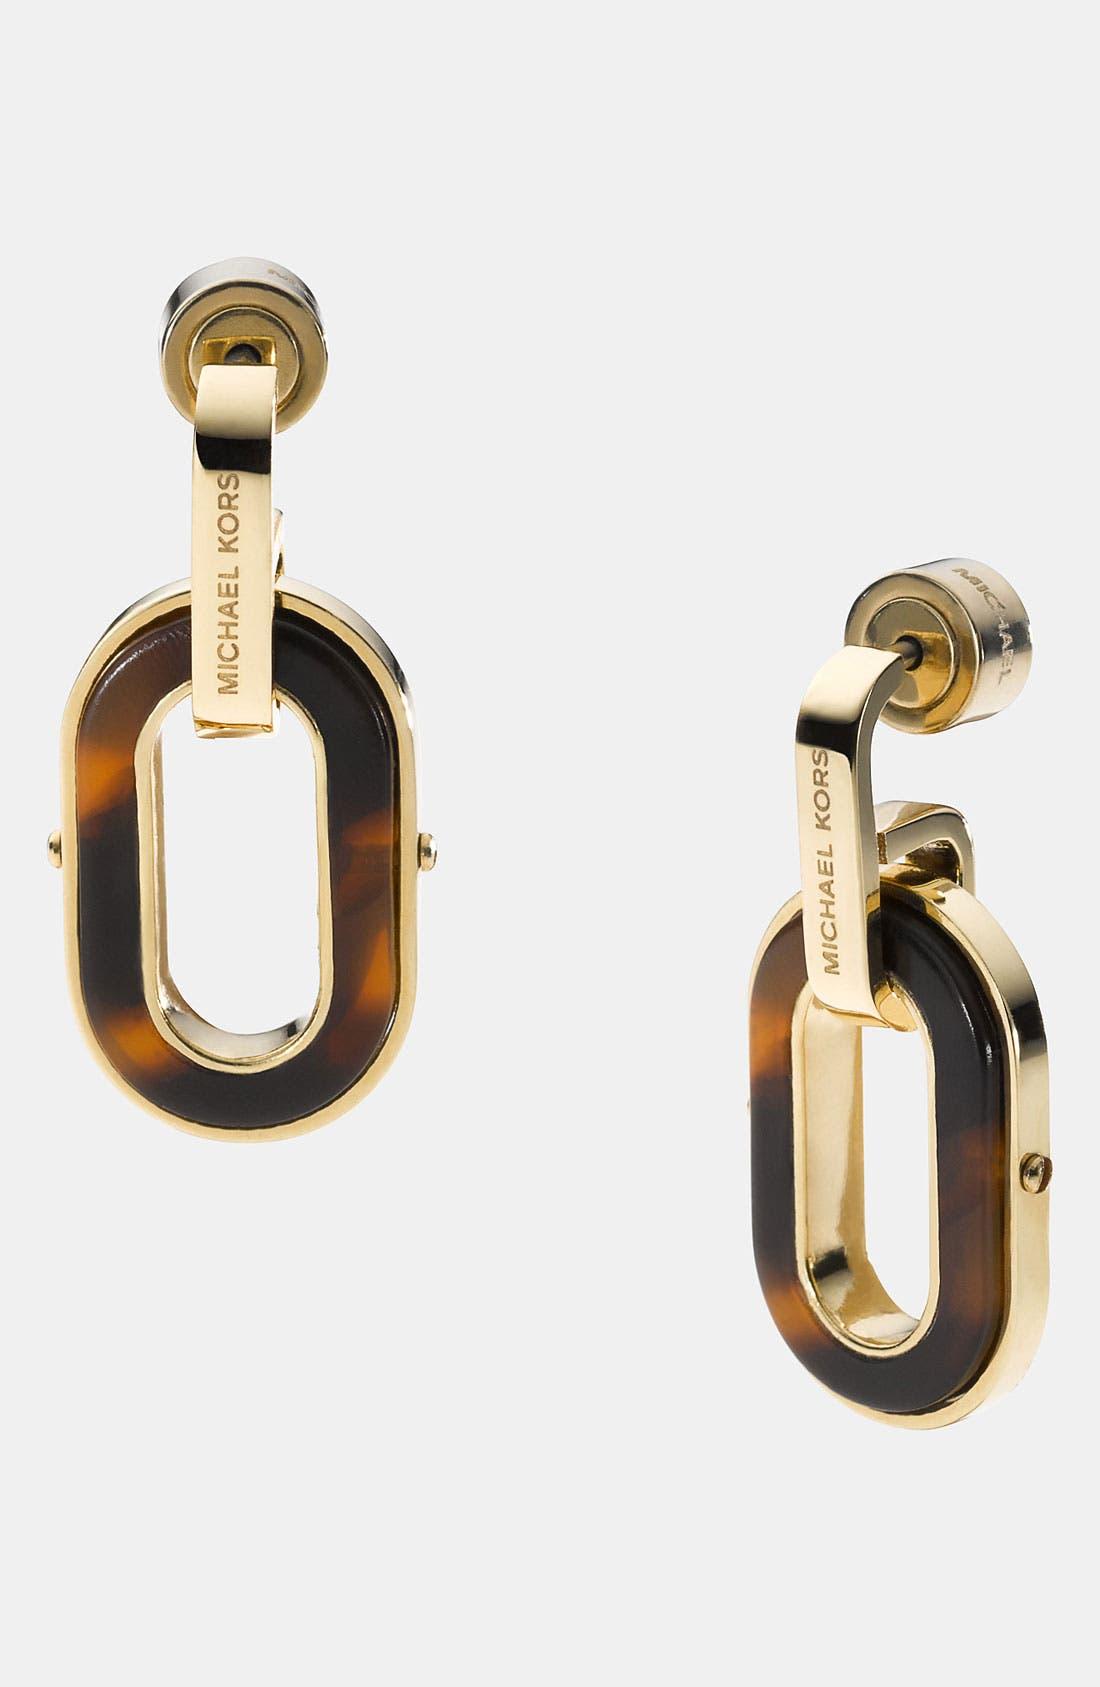 Main Image - Michael Kors 'Jet Set' Drop Earrings